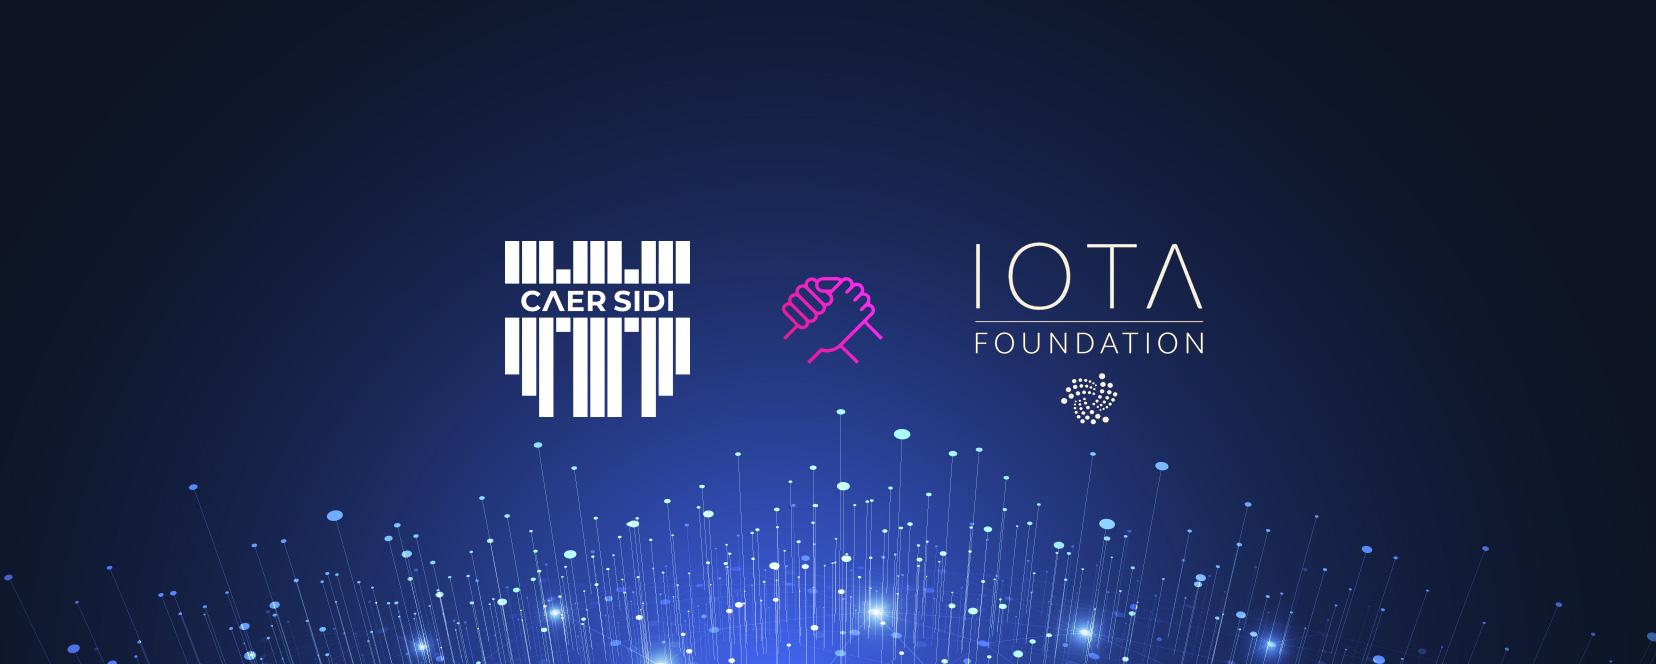 Caer Sidi partnering with the IOTA Foundation